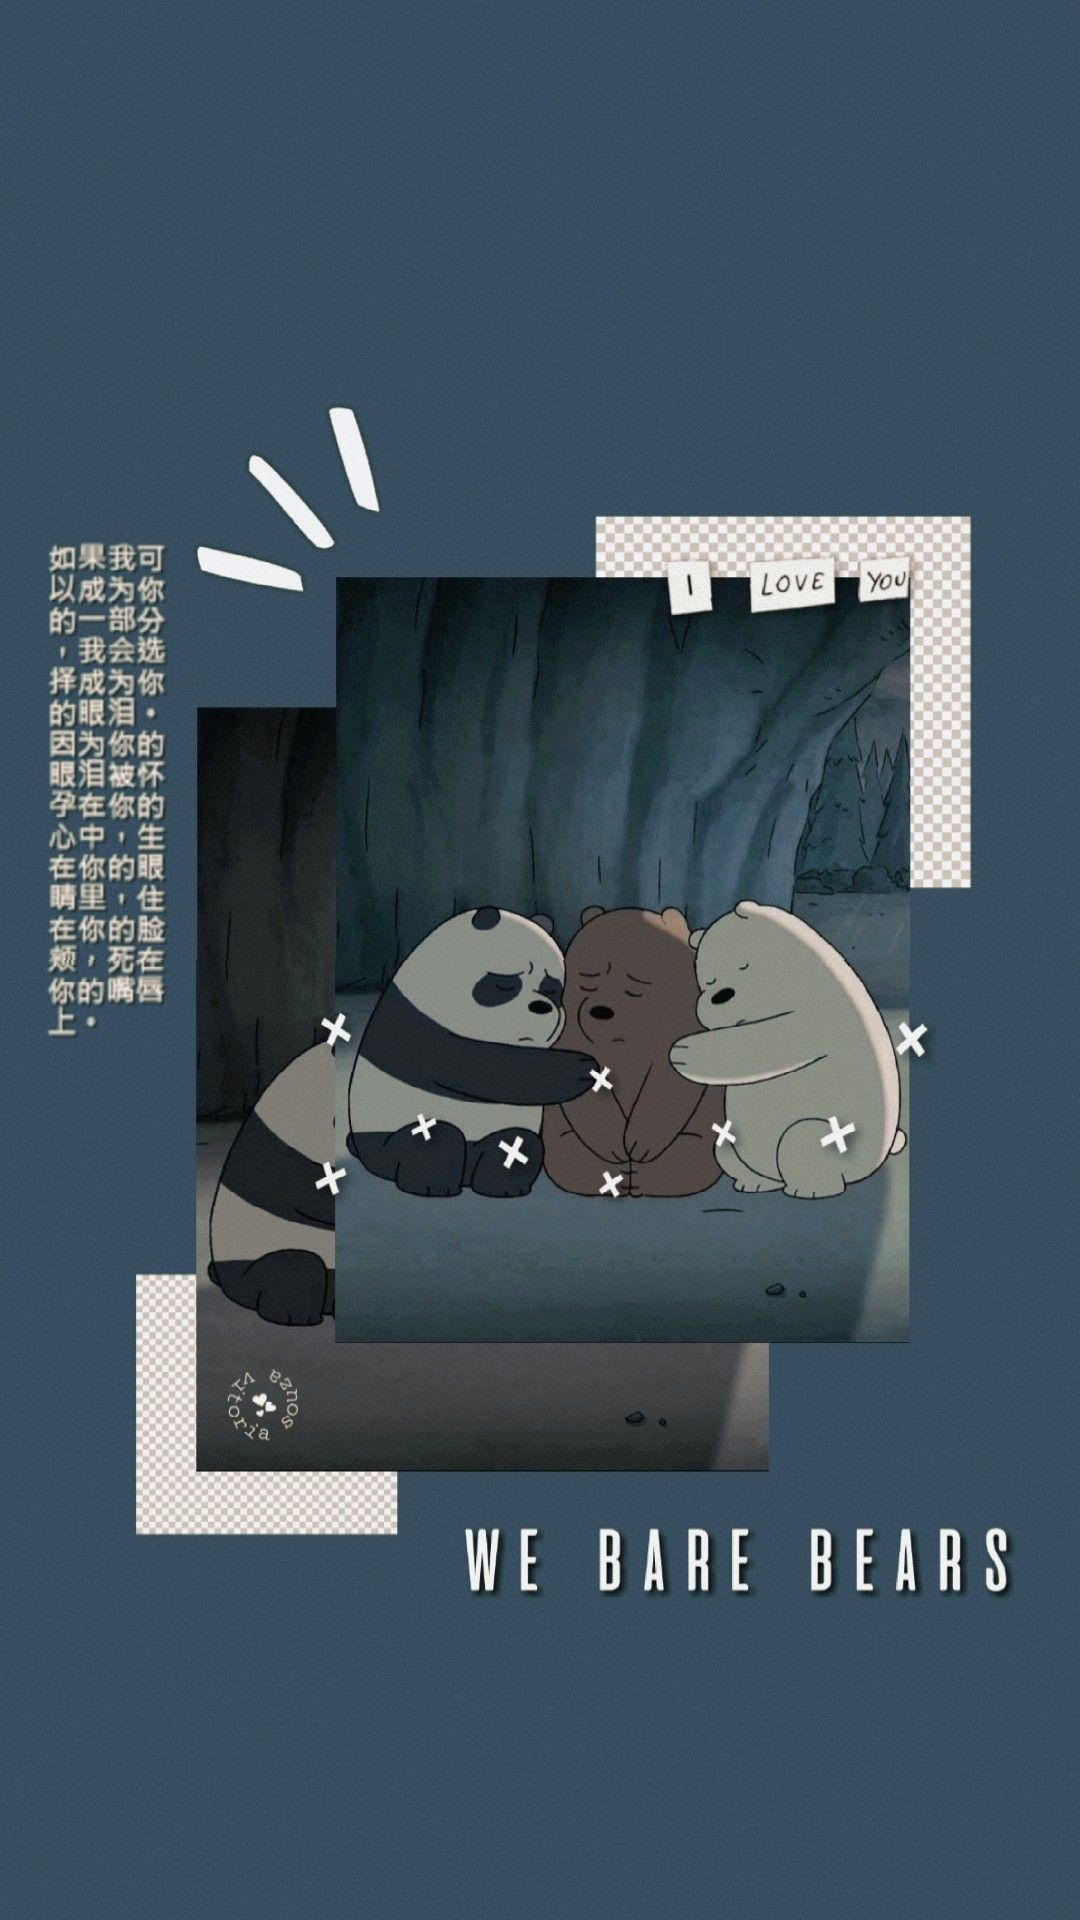 Wallpaper We Bare Bears Lockscreen Kartun Wallpaper Lucu Hewan Lucu